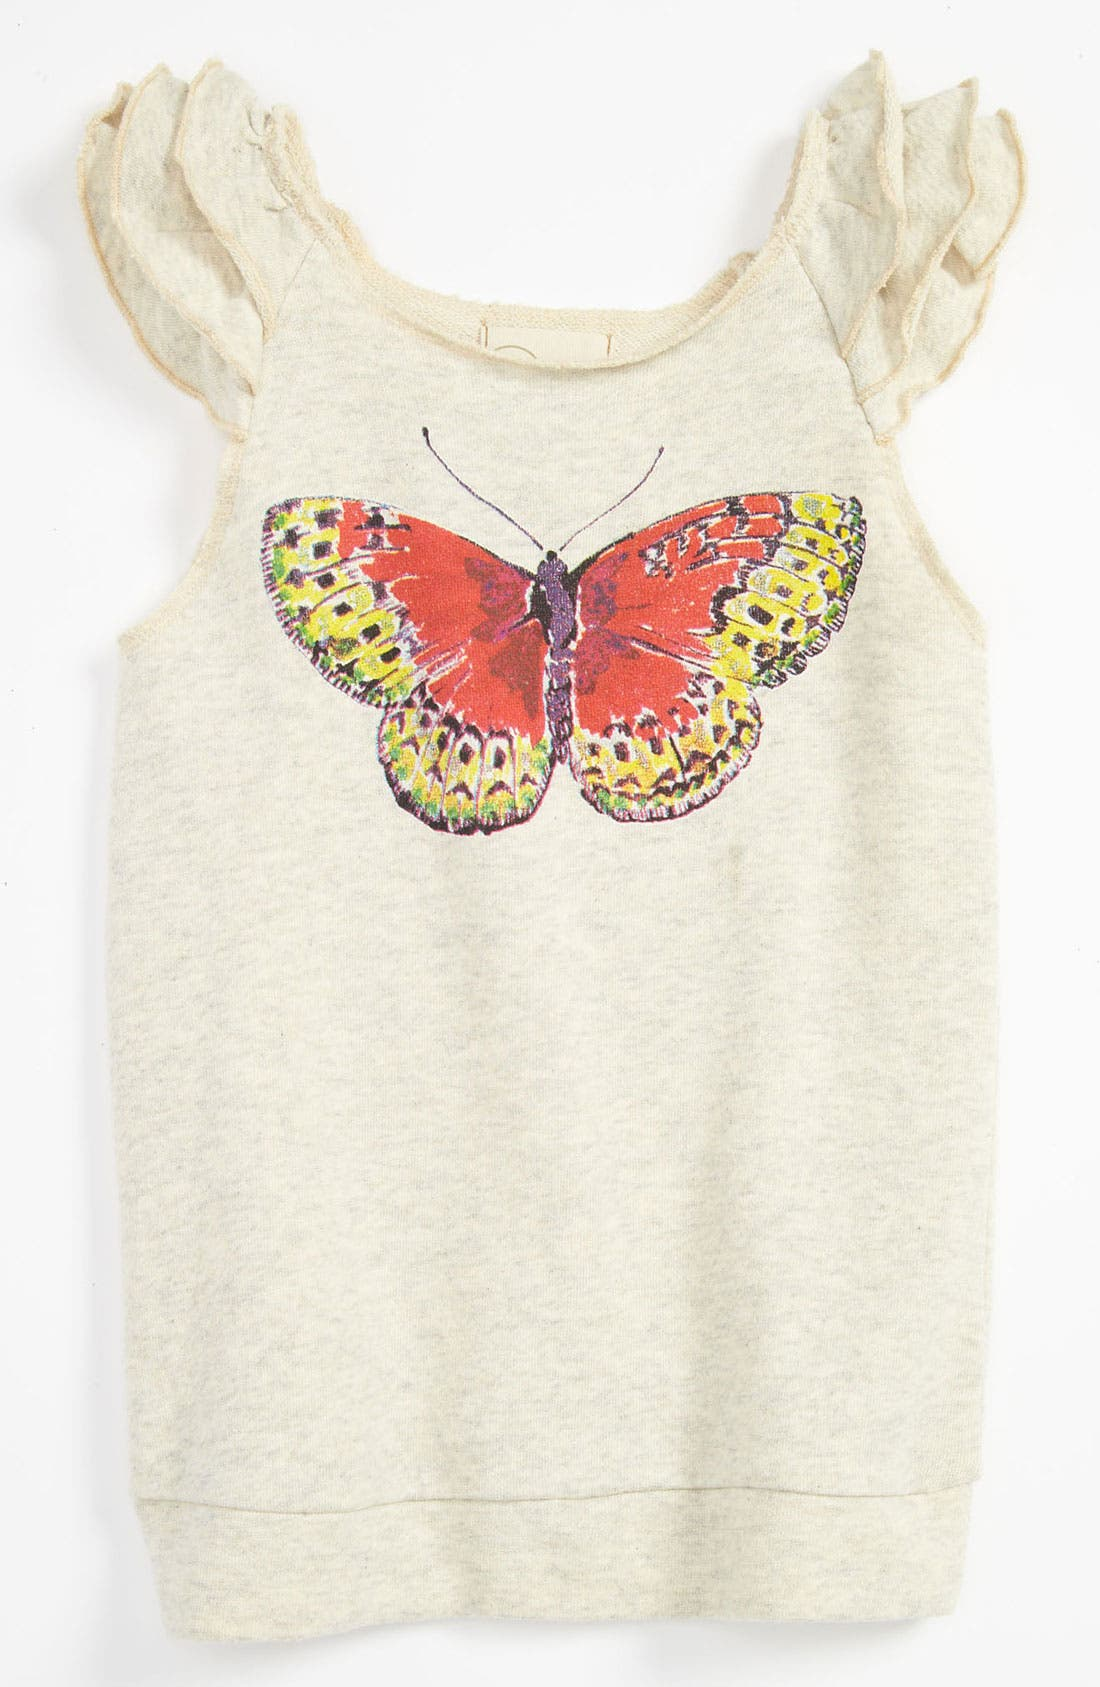 Alternate Image 1 Selected - Peek 'Butterfly' Top (Toddler, Little Girls & Big Girls)